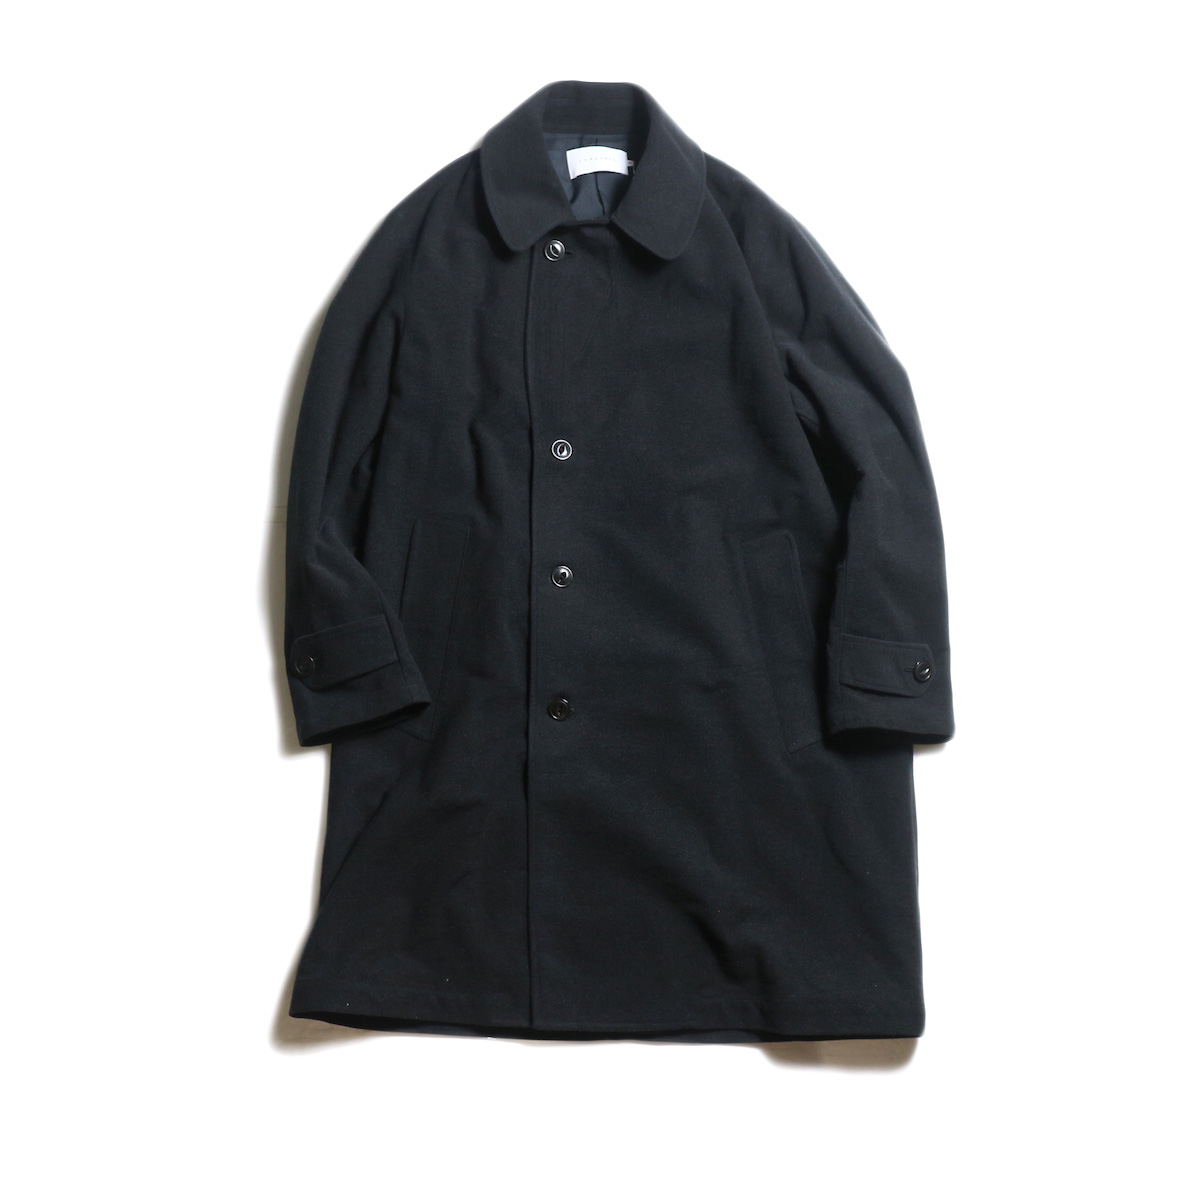 CURLY / PRESTON COAT (Black)